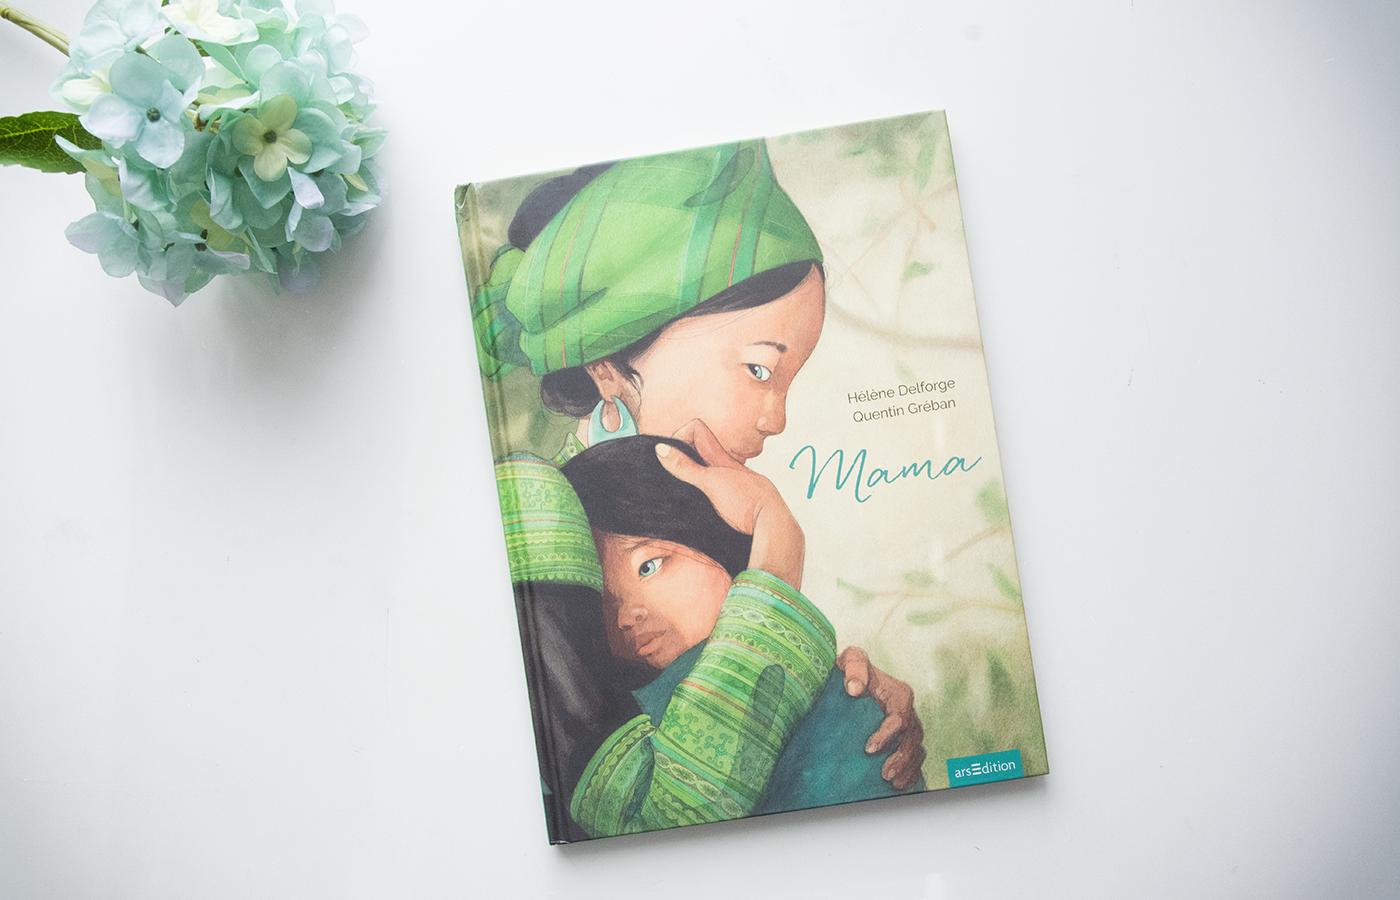 Literaturbesprechung:  »Mama« von Hélén Delforge und Quentin Gréban